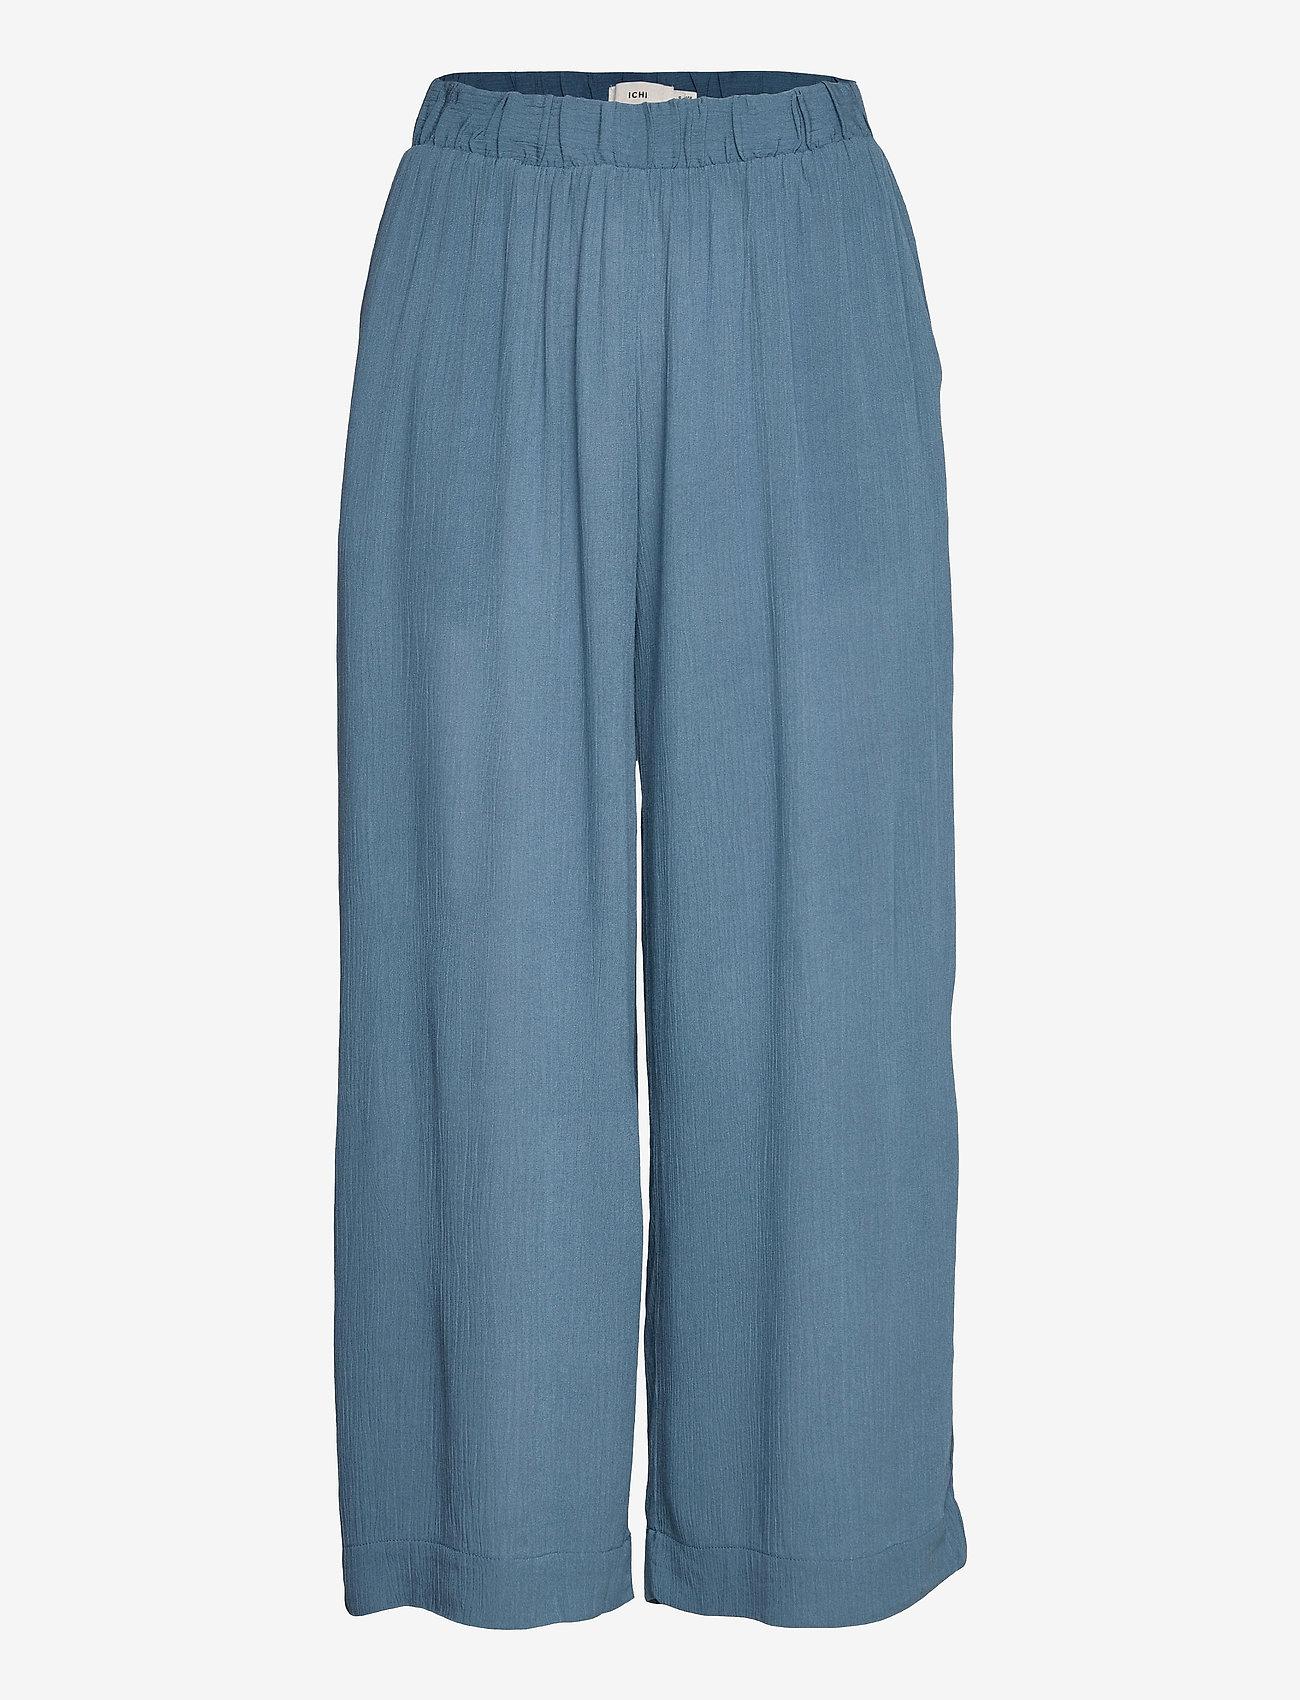 ICHI - IHMARRAKECH SO PA - casual trousers - coronet blue - 0